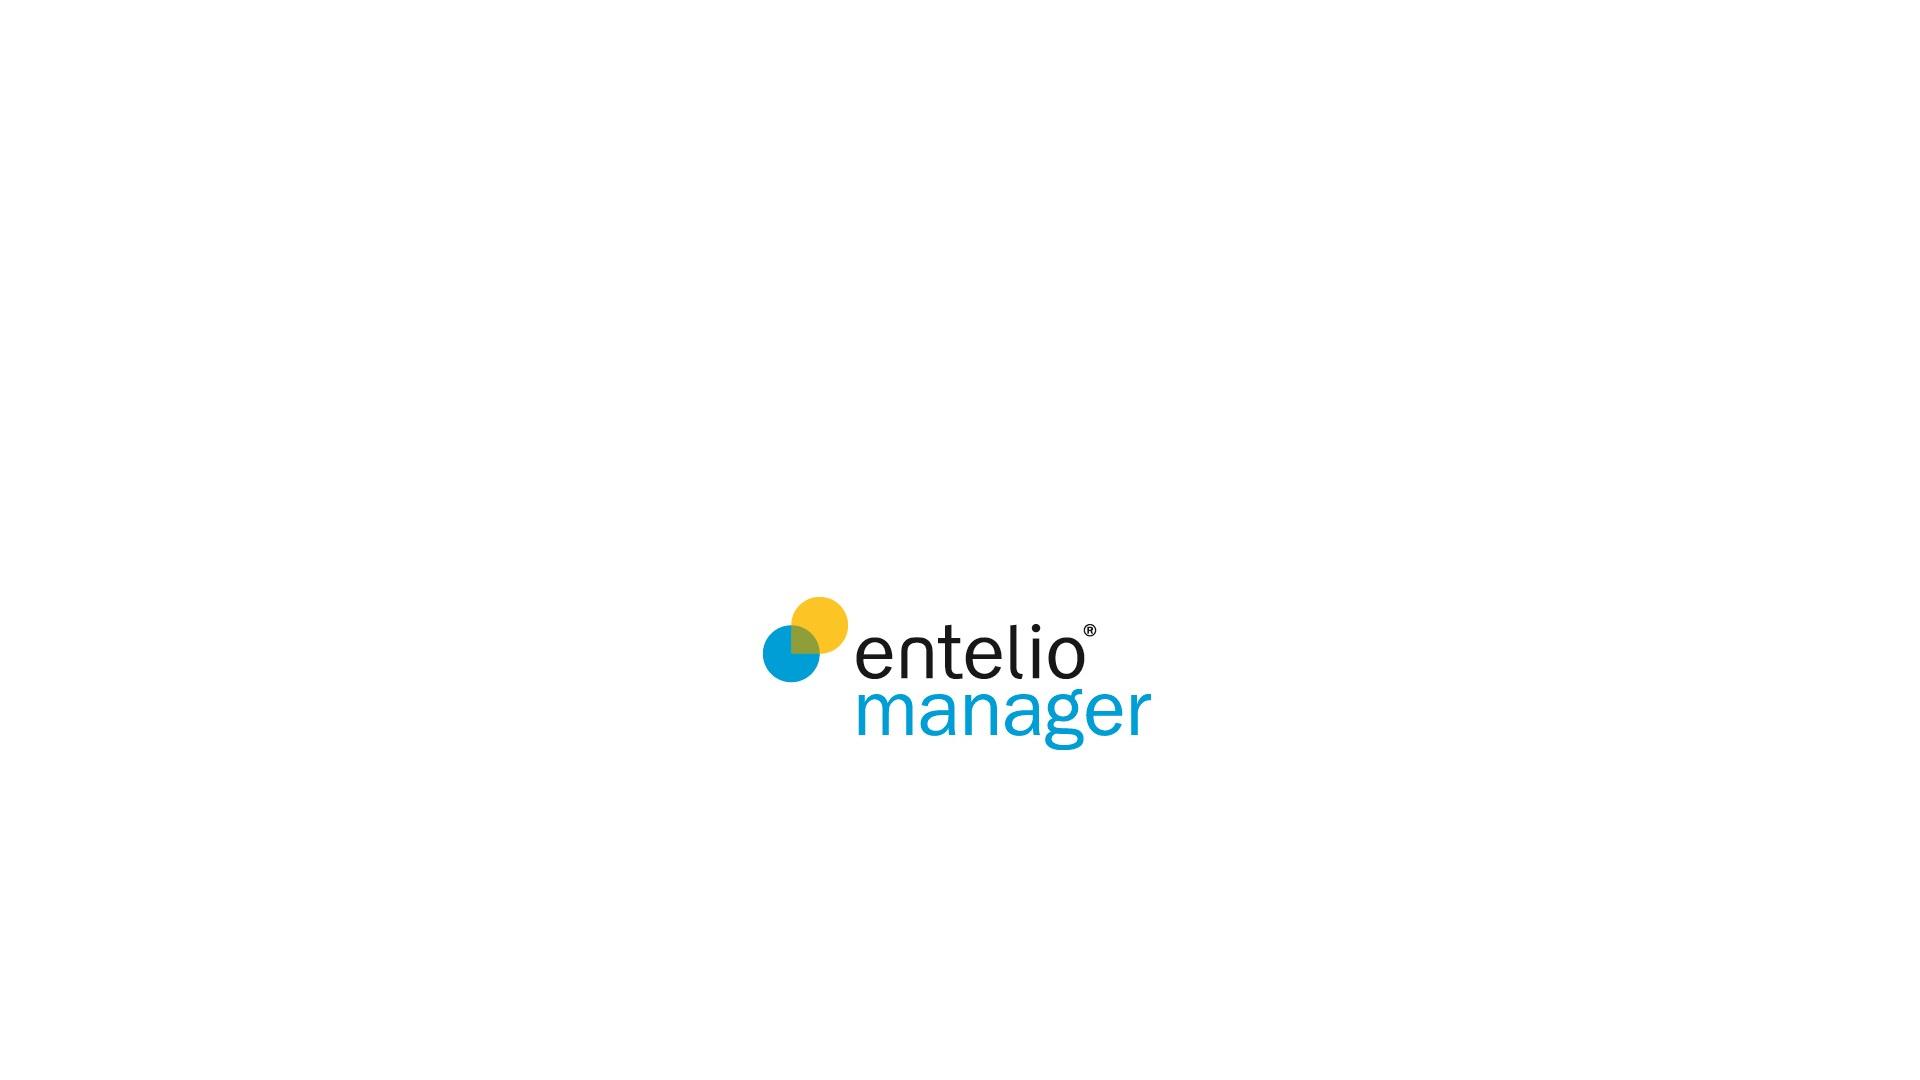 Entelio manager